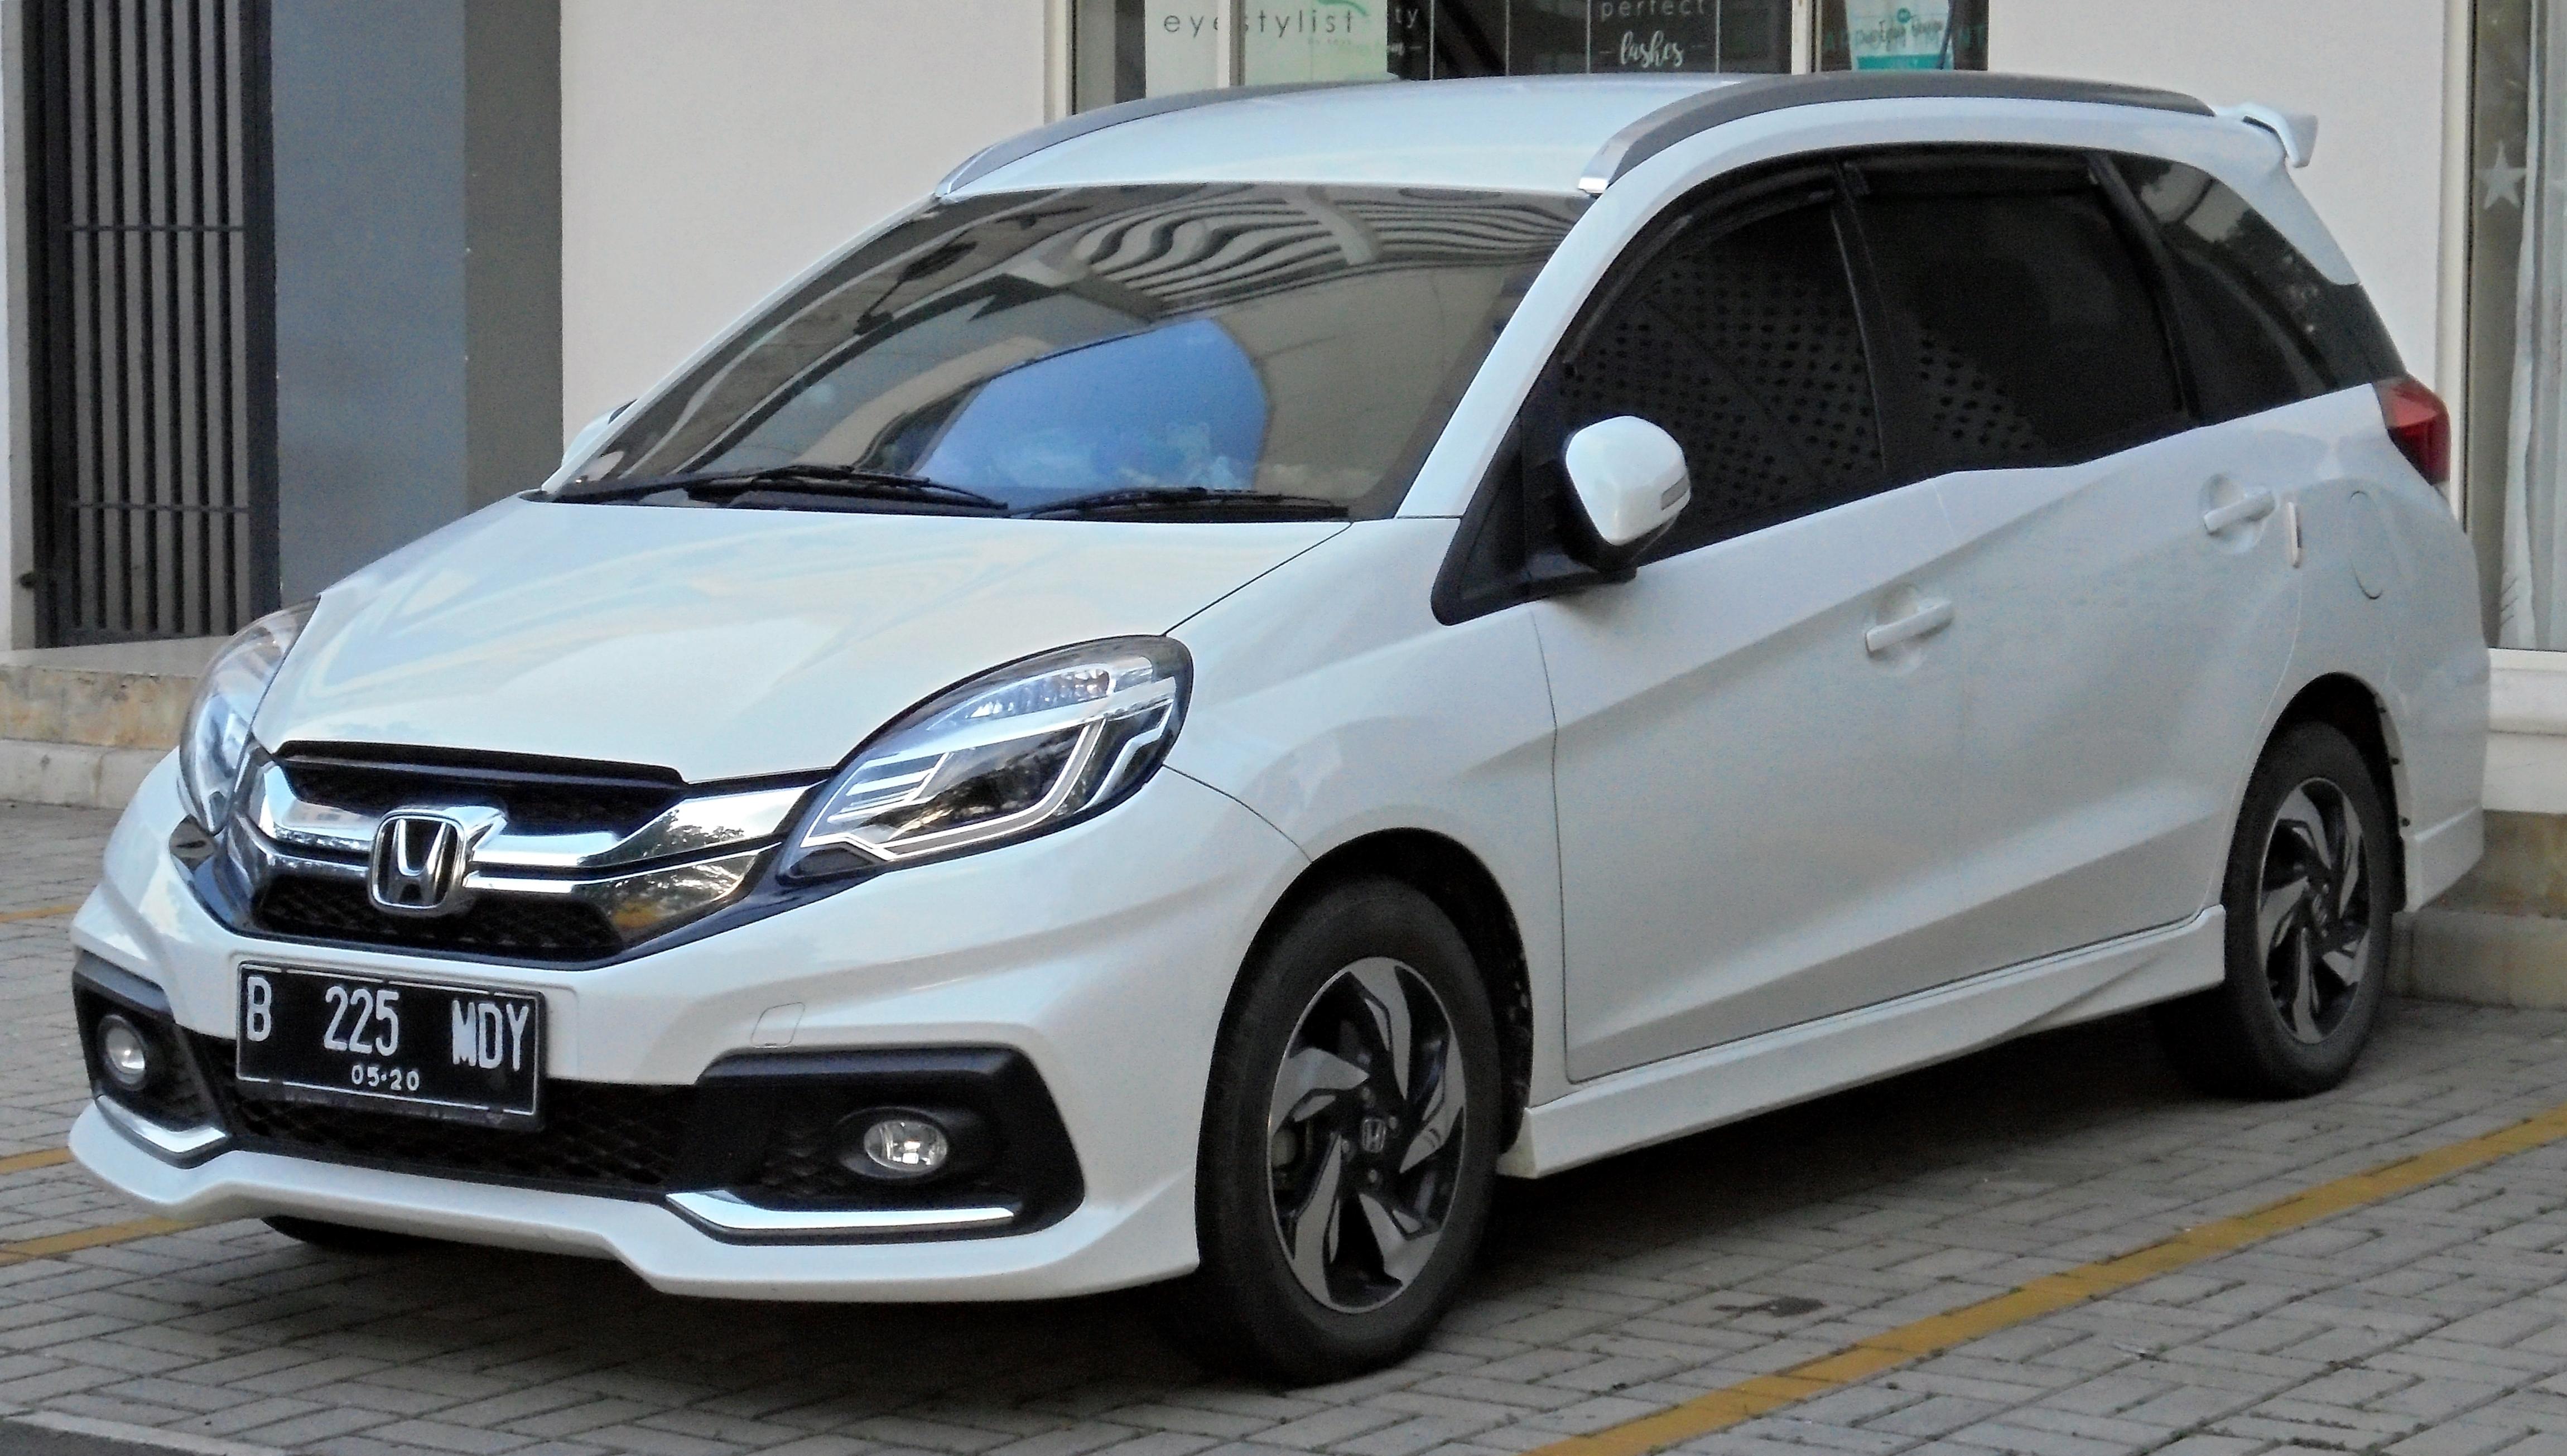 Kelebihan Honda Mobilio 2019 Perbandingan Harga